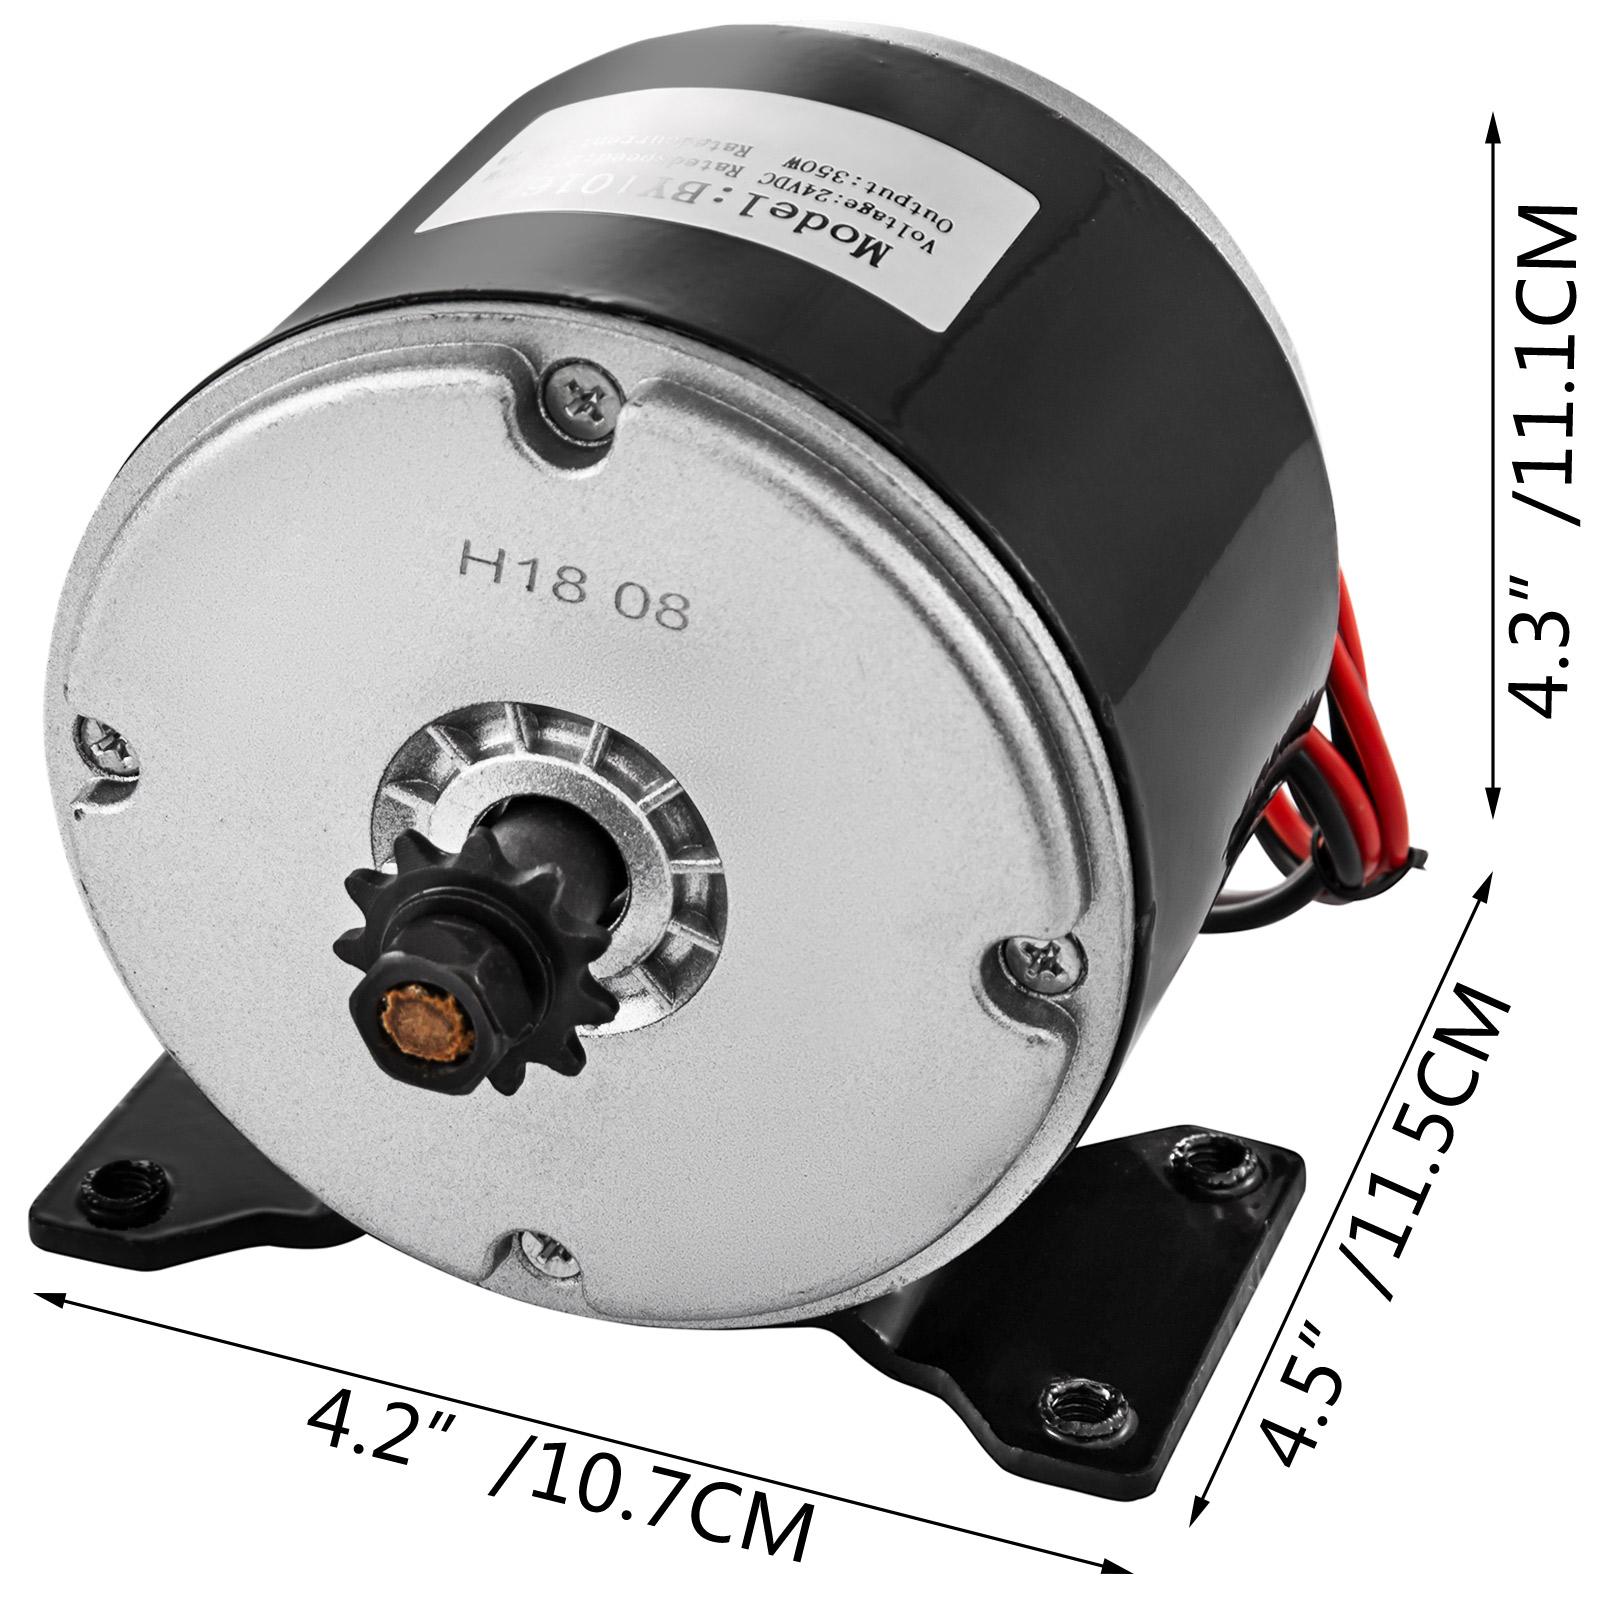 24V-500W-3500RPM-Electric-Motor-f-scooter-bike-go-kart-minibike-MY1016 thumbnail 32